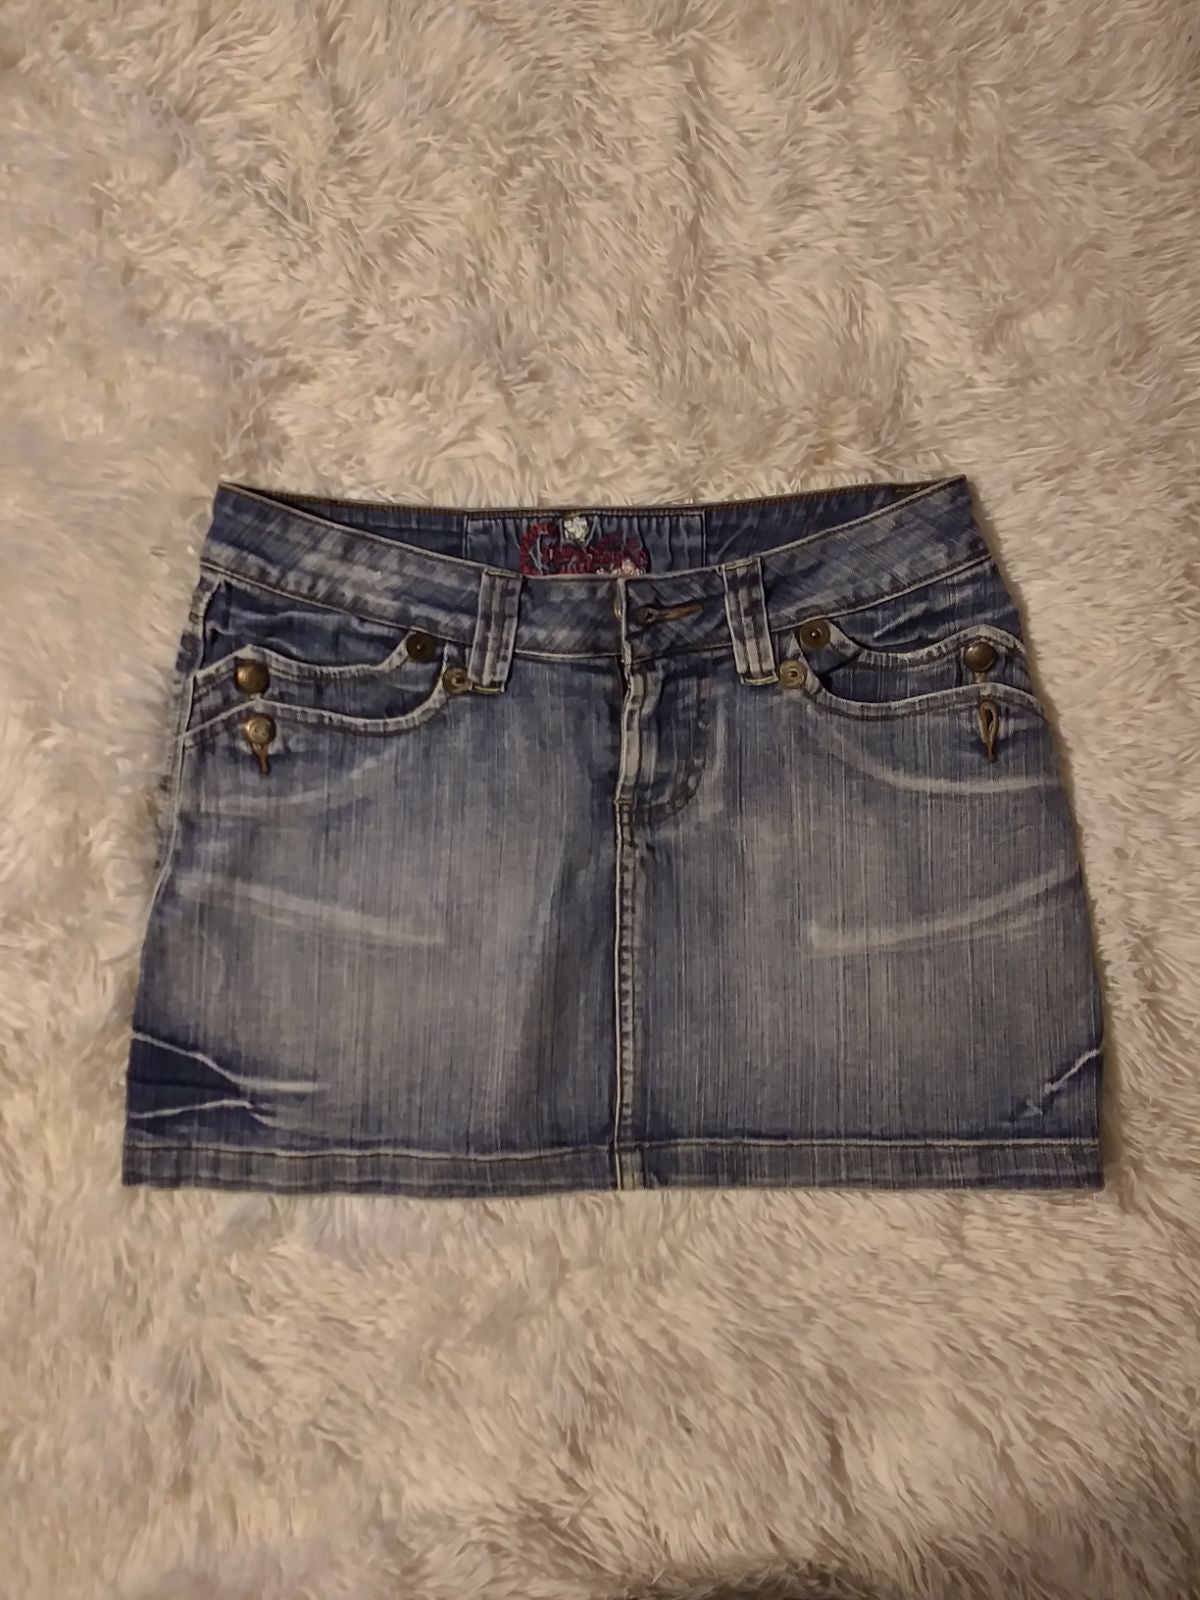 Vintage Candie's mini skirt